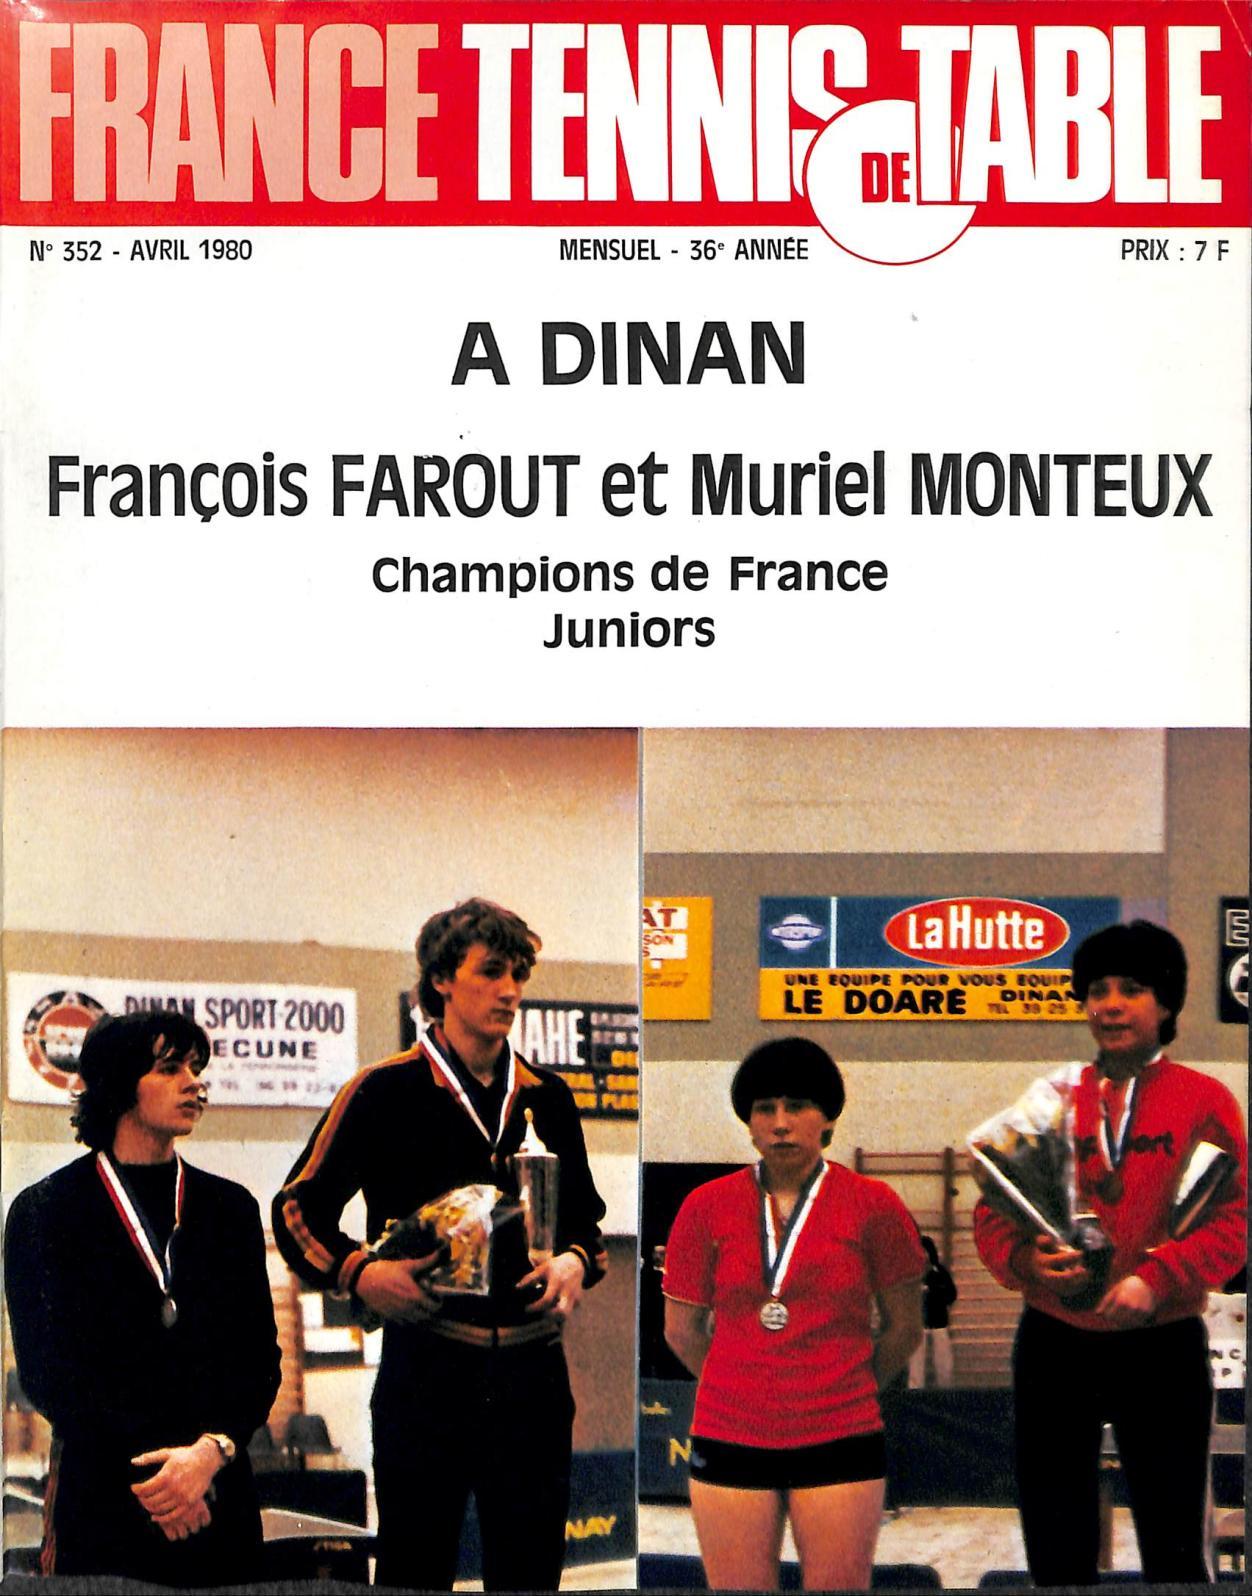 De 1980 Tennis Calaméo 04 352 France Table OP0wkX8n